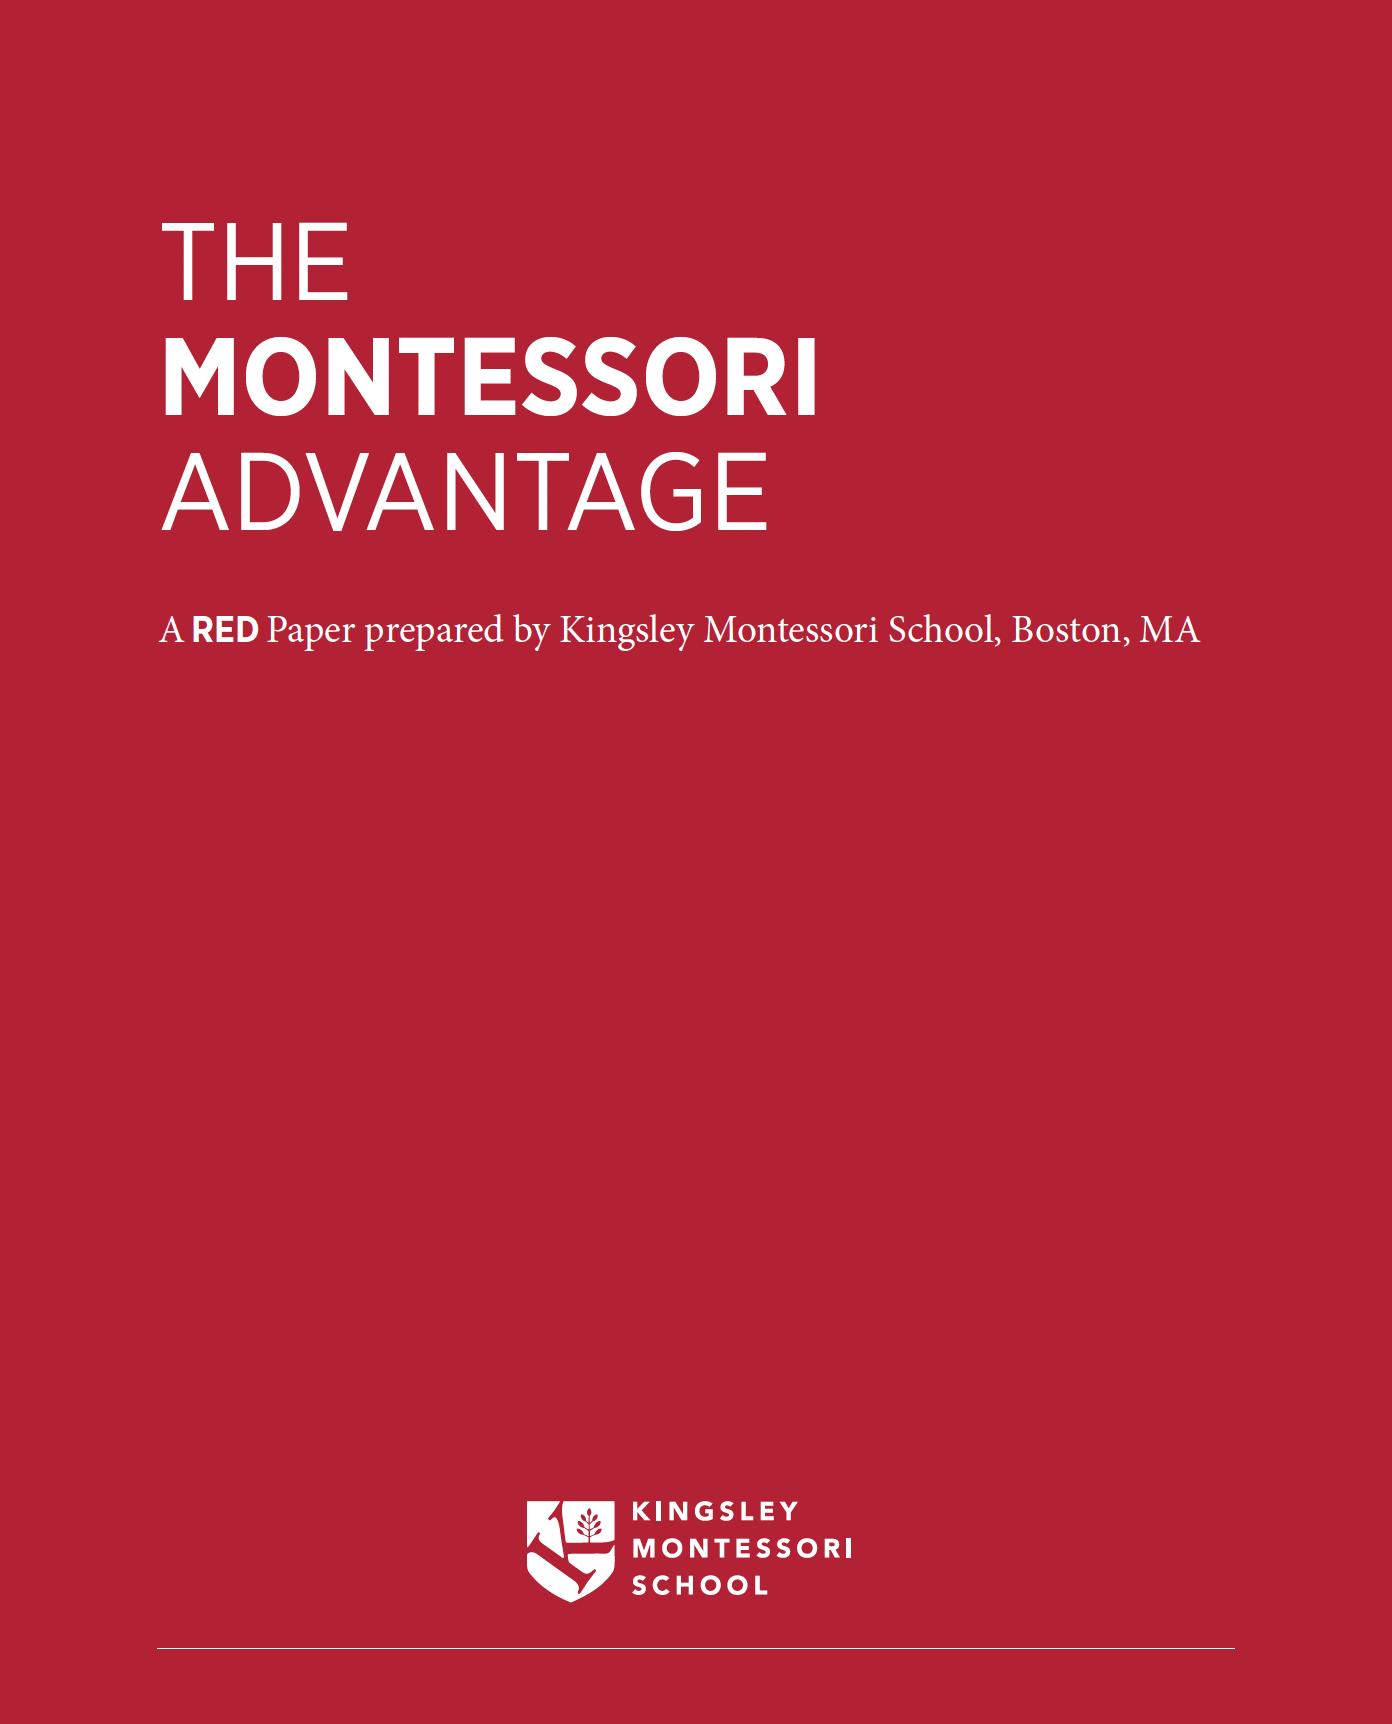 montessori advantages, educational philosophy, maria montessori, montessori materials